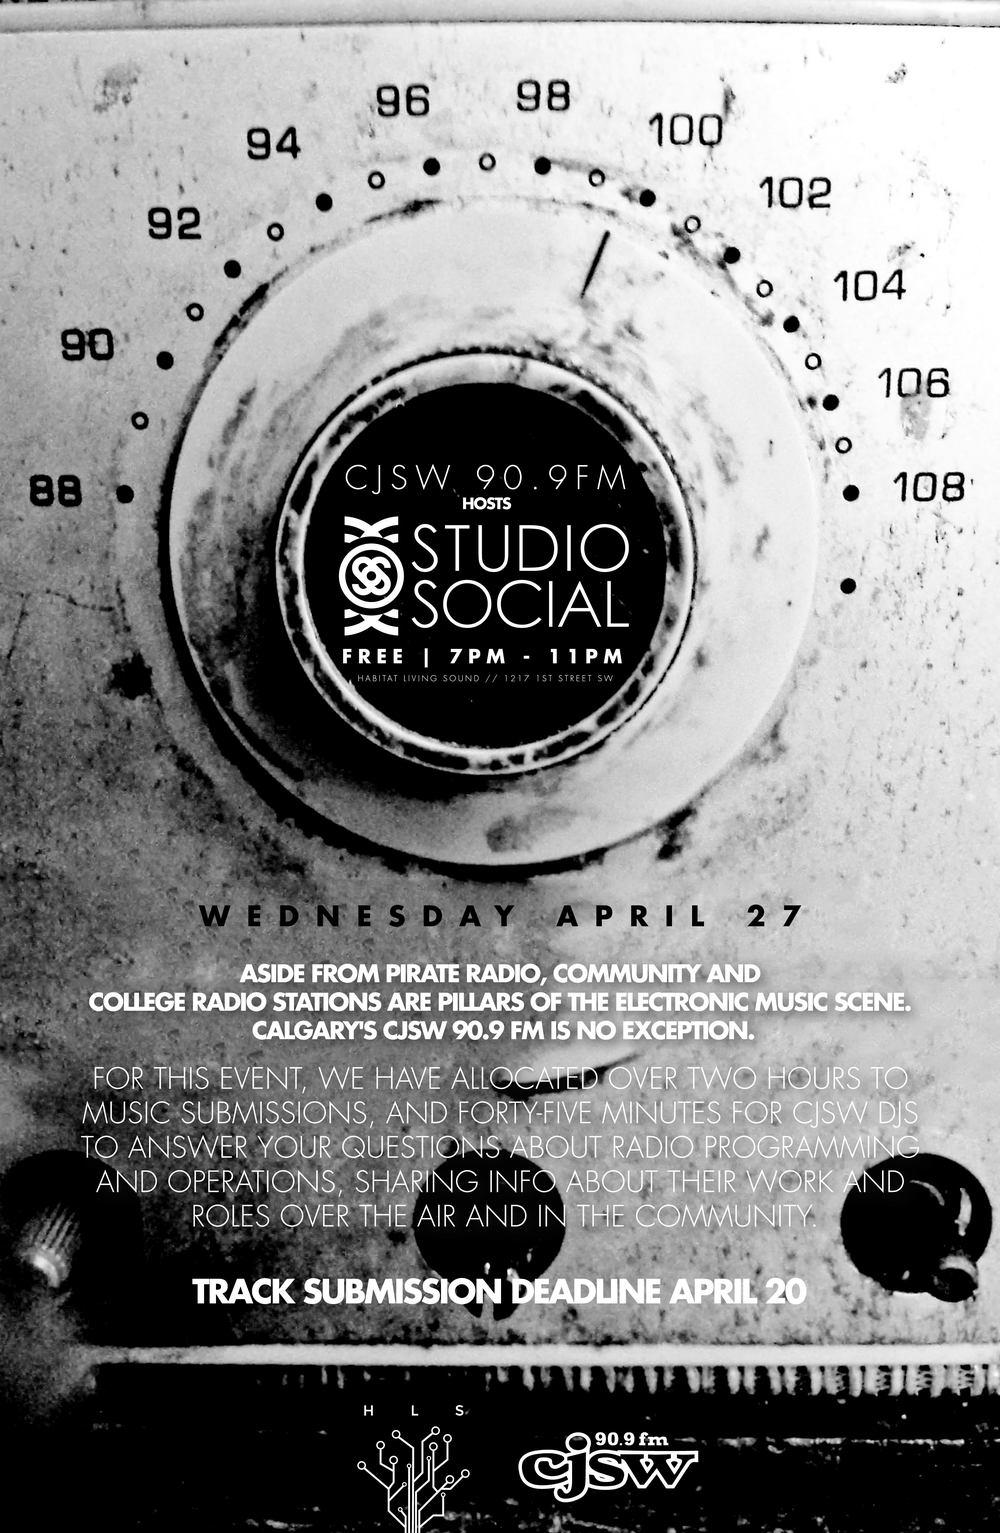 studio-social-cjsw-april-habitat-living-sound.jpeg